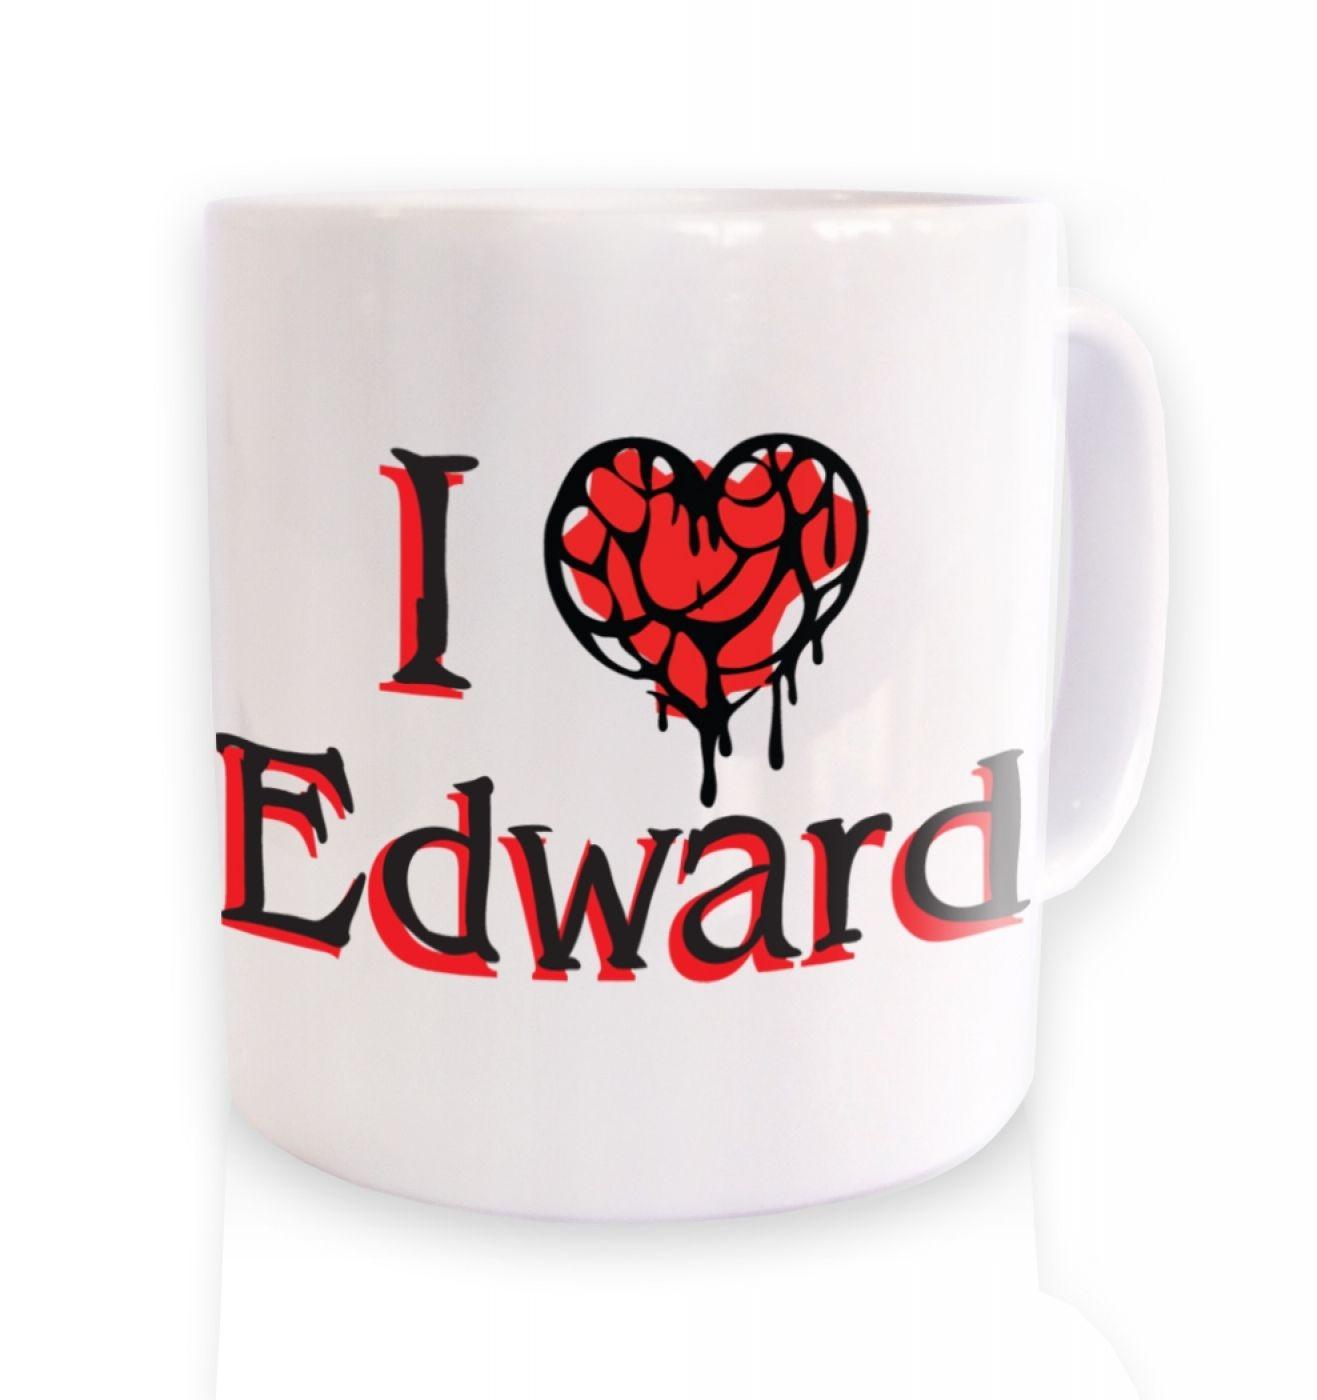 I Heart Edward ceramic coffee mug